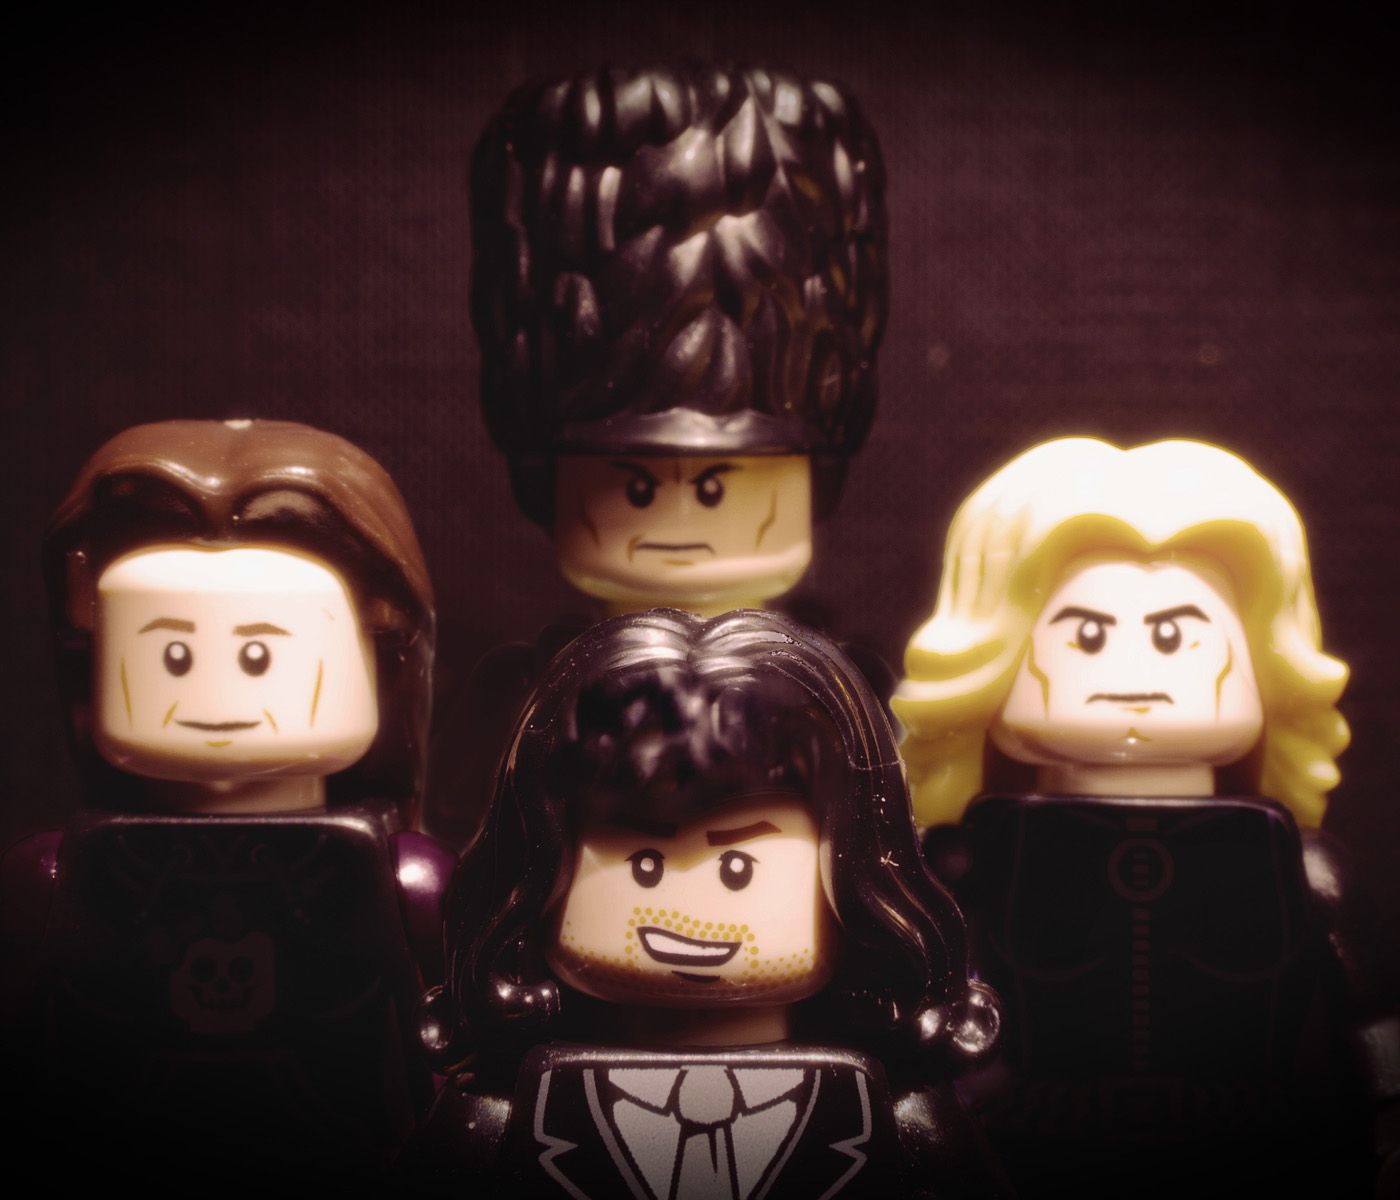 Lego: Queen - Bohemian Rhapsody   What makes me laugh/think